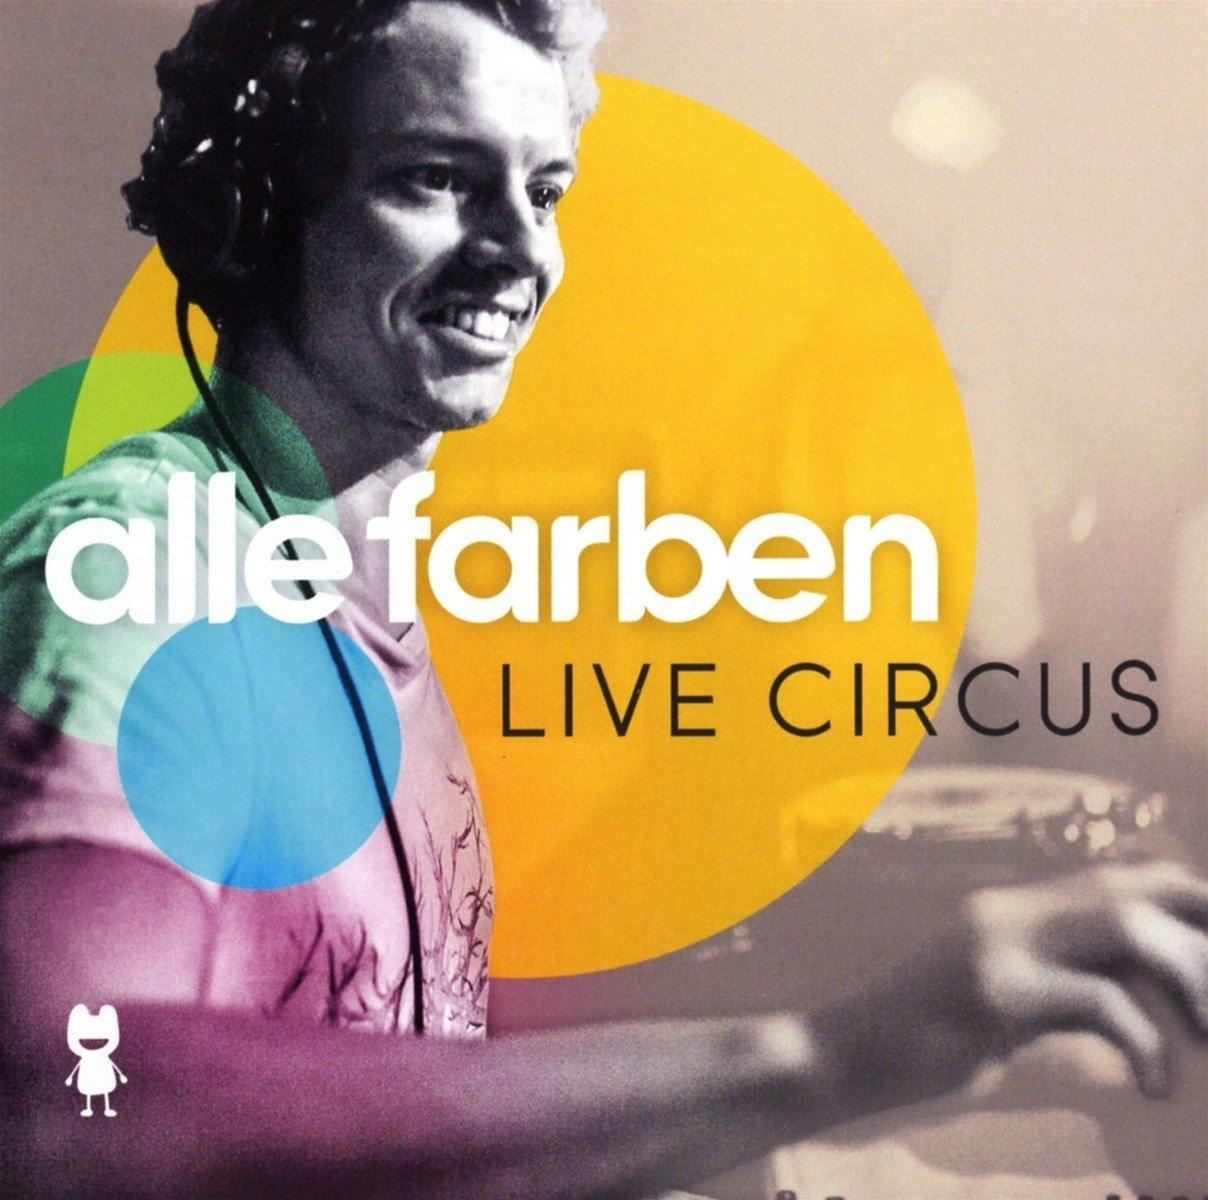 Music Is My Best Friend [Ltd. Digipack - Audio CD] - Alle Farben ...